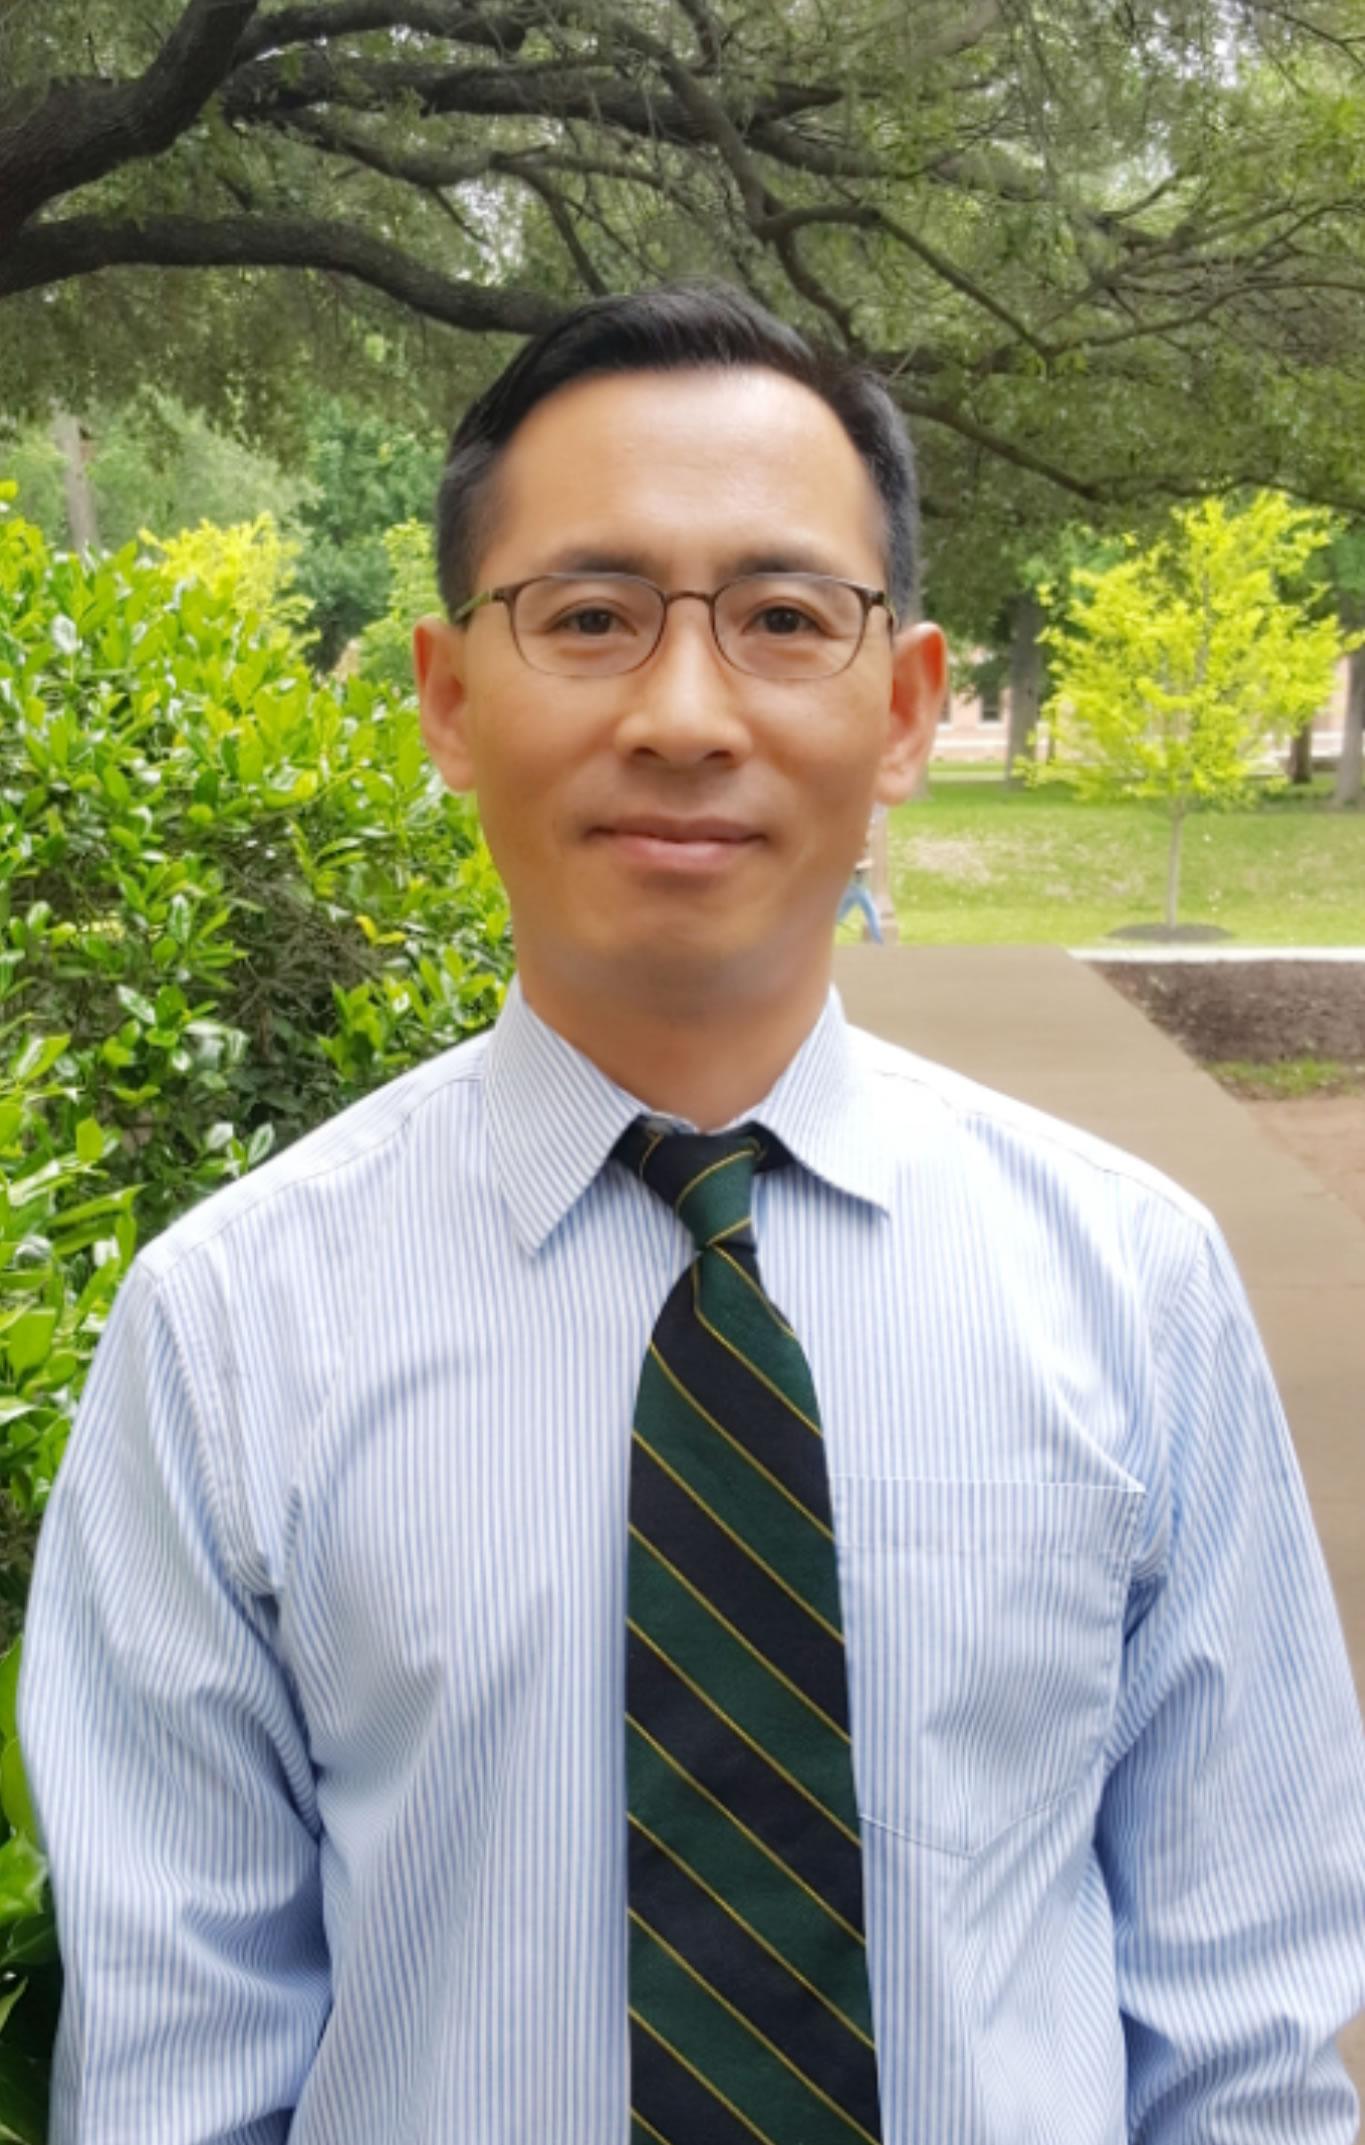 Jungjun Park, Ph.D. CCC/SLP